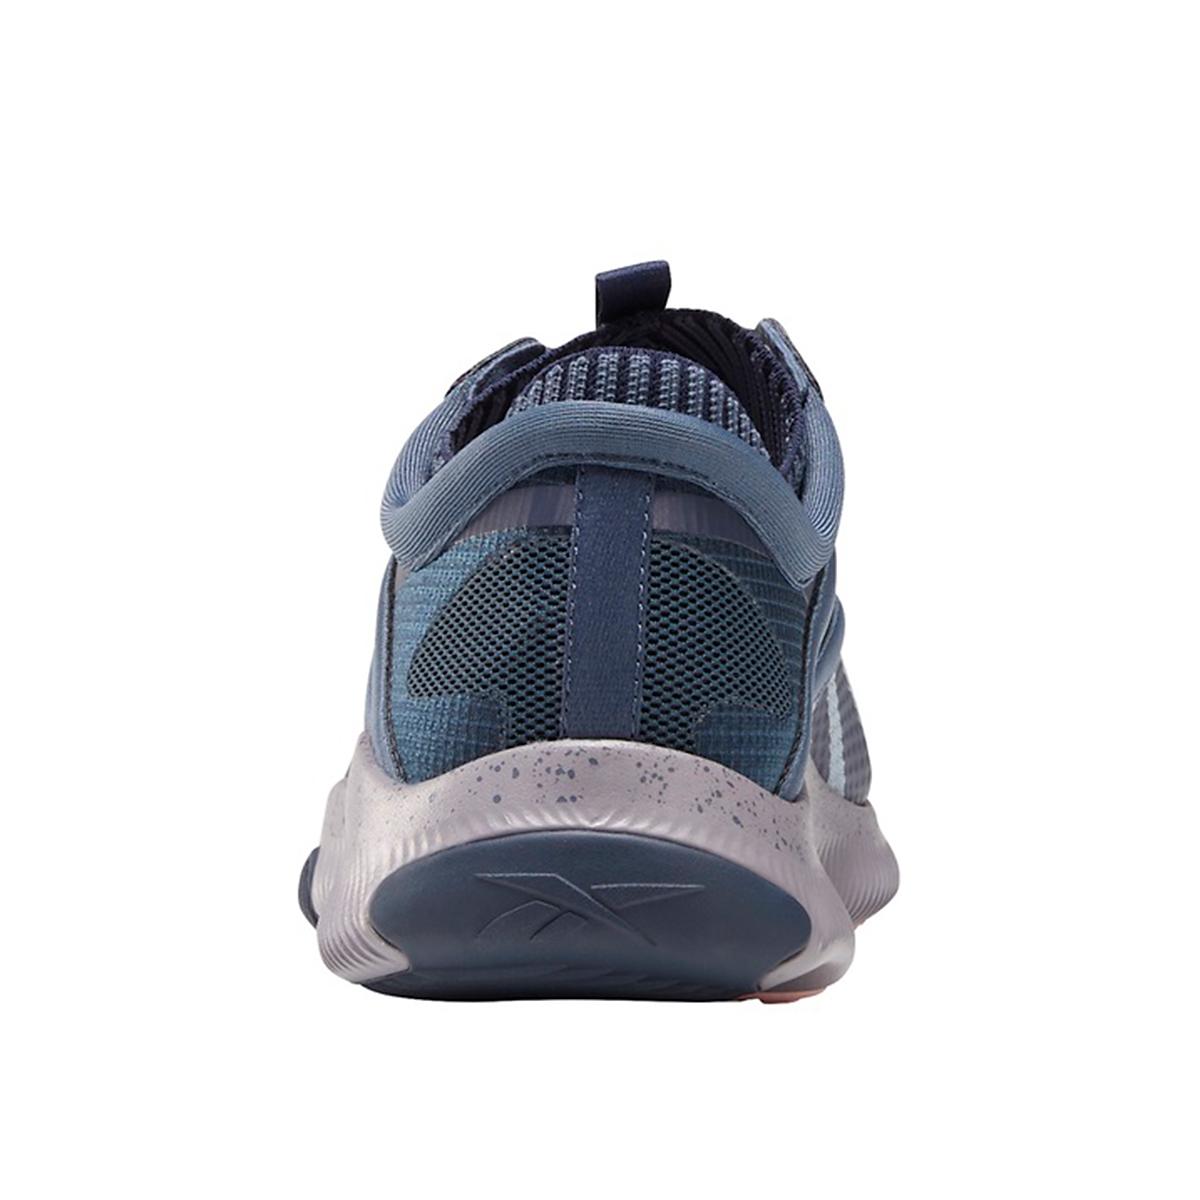 Women's Reebok HIIT Training Shoe - Color: Smoky Indigo/Meteor Grey/White - Size: 5 - Width: Regular, Smoky Indigo/Meteor Grey/White, large, image 4